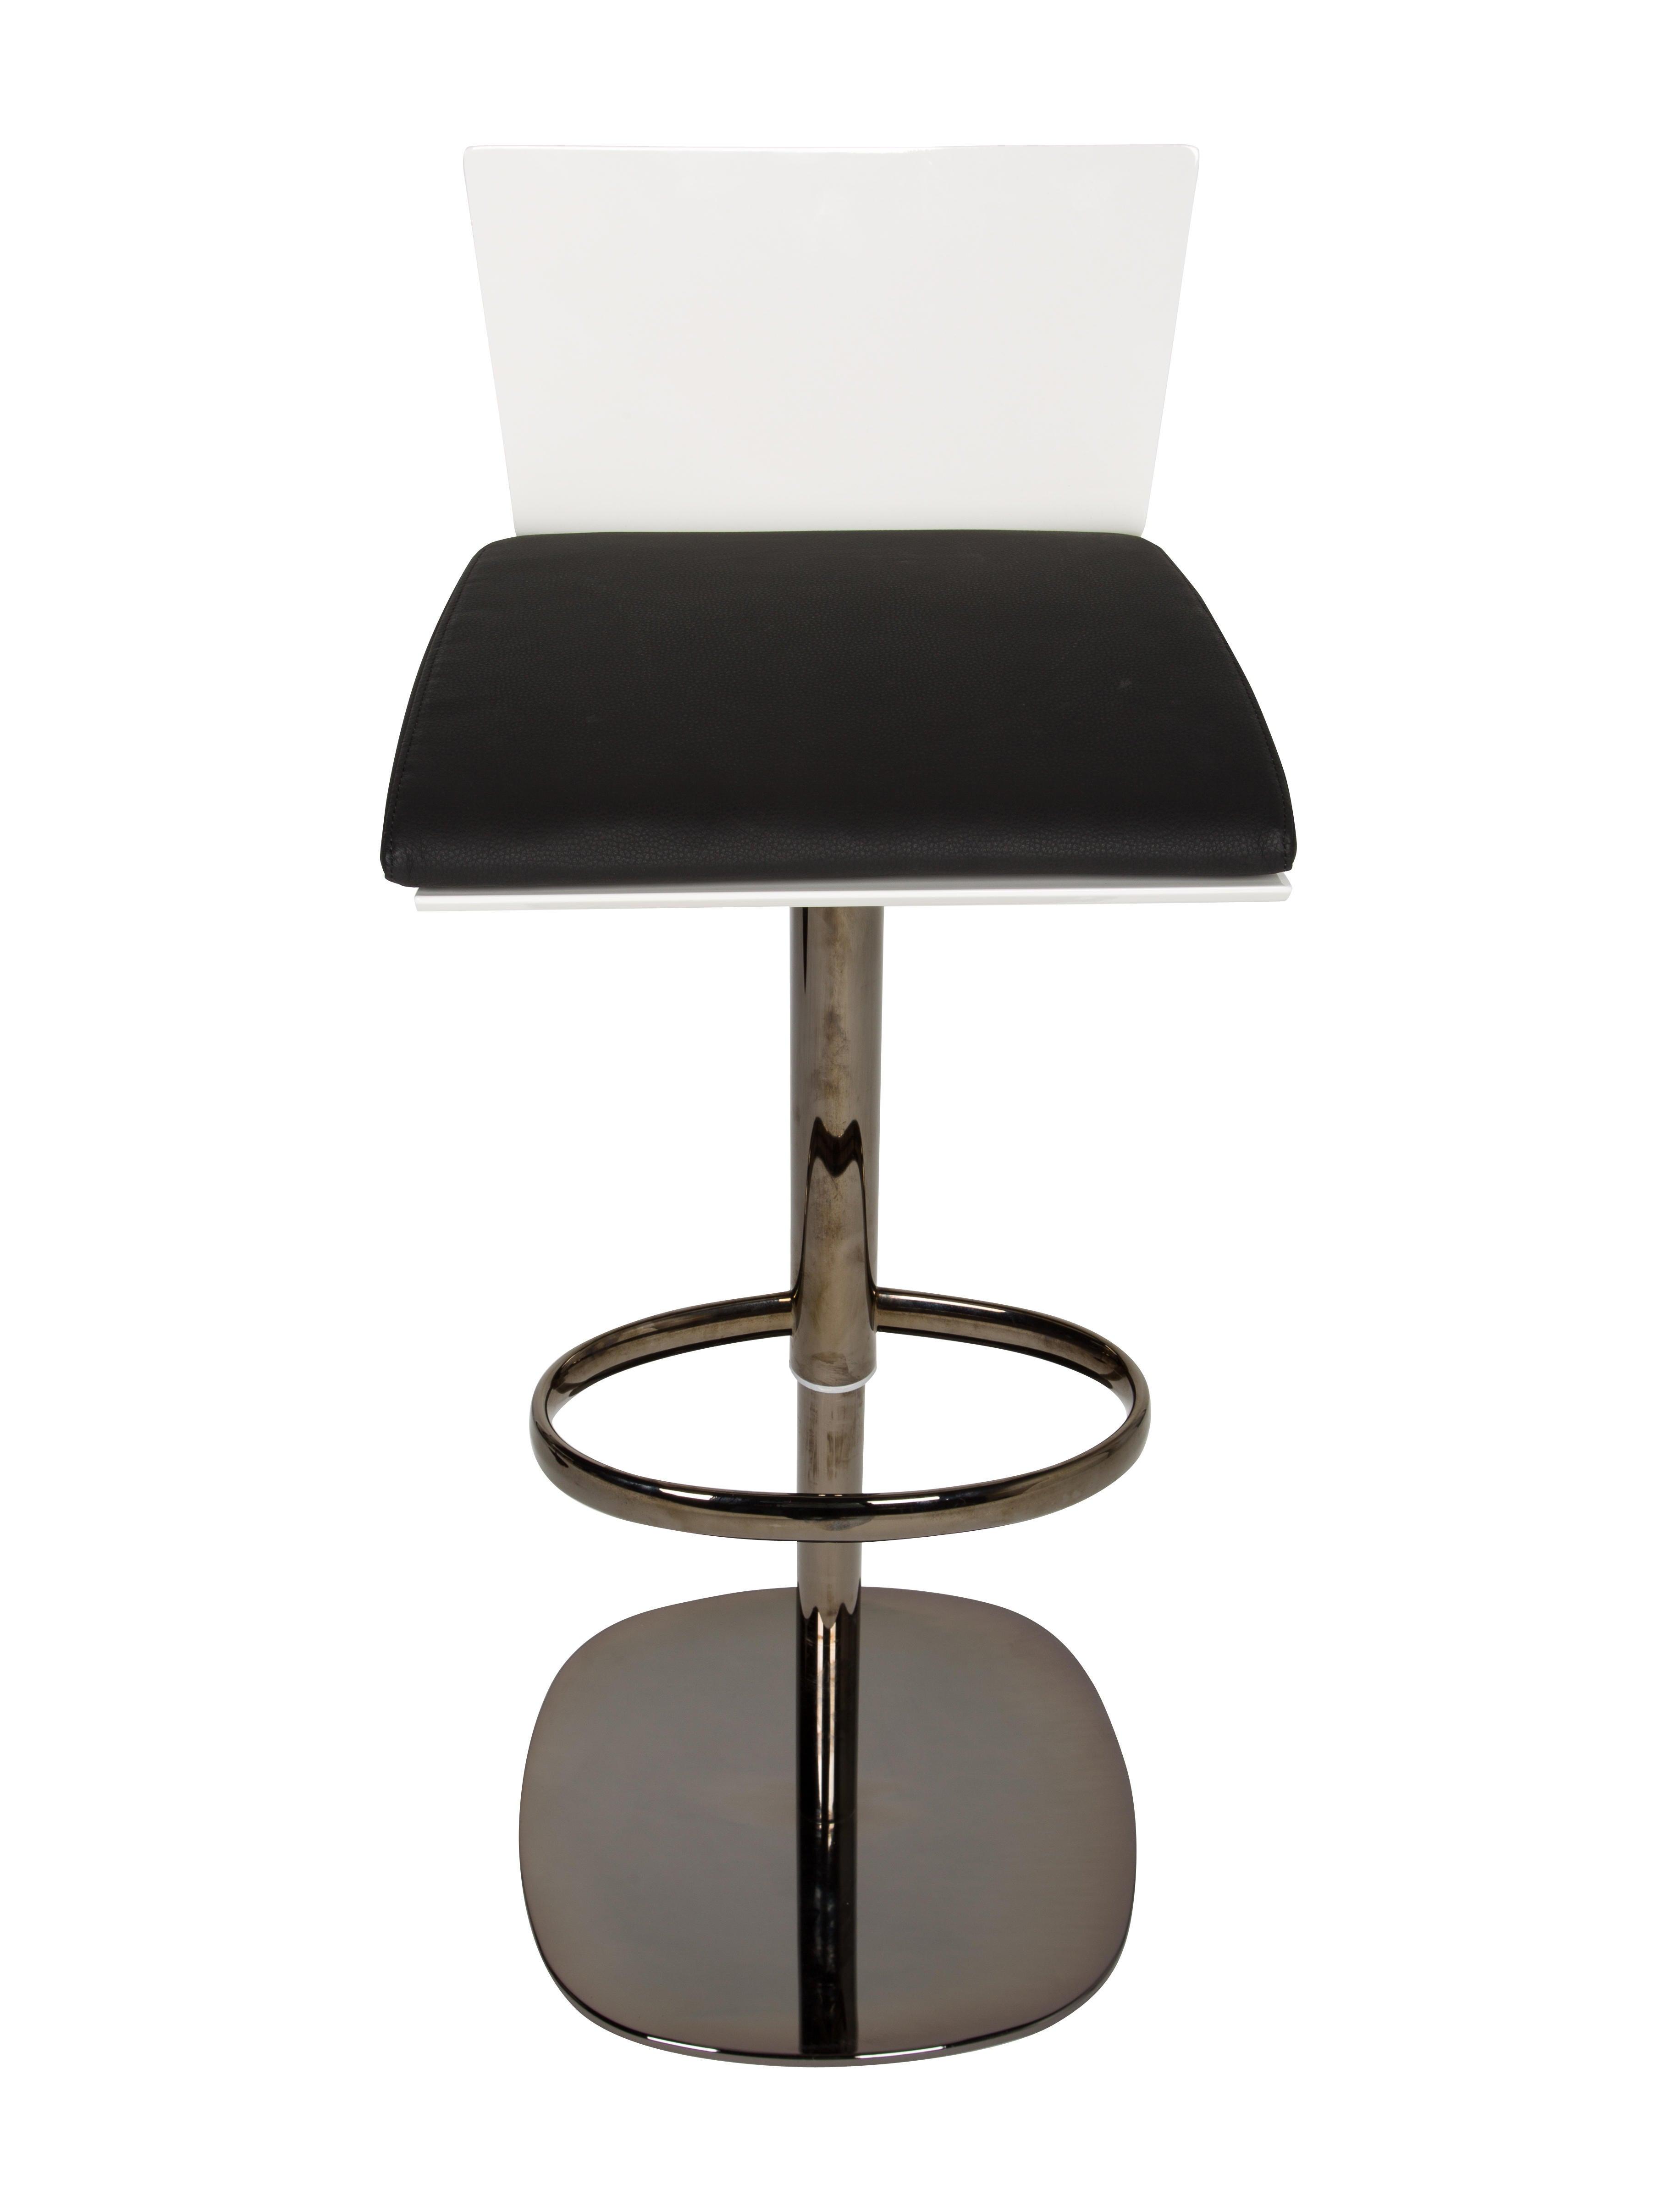 Roche bobois ublo bar stool furniture bob20040 the for Bar roche bobois